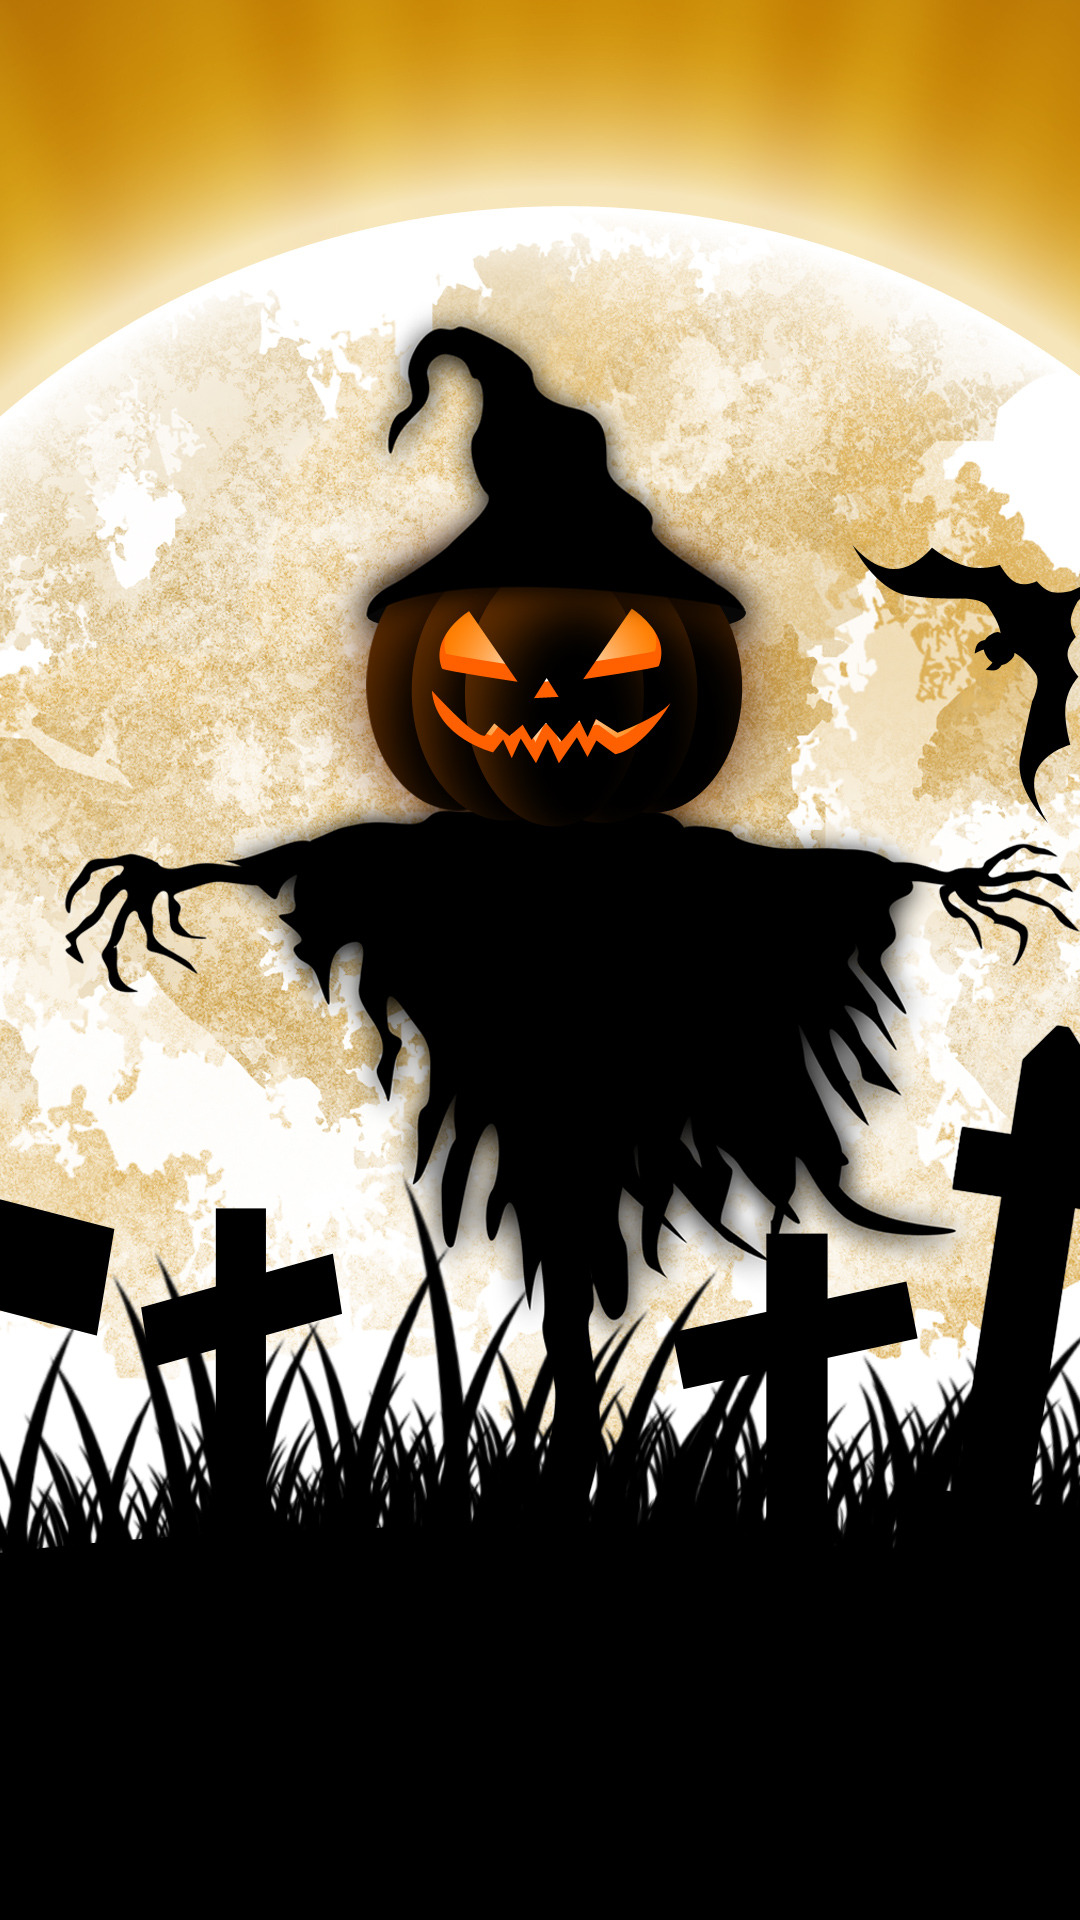 Free Download Scarecrow Halloween Iphone 6 Iphone 6 Plus Wallpaper